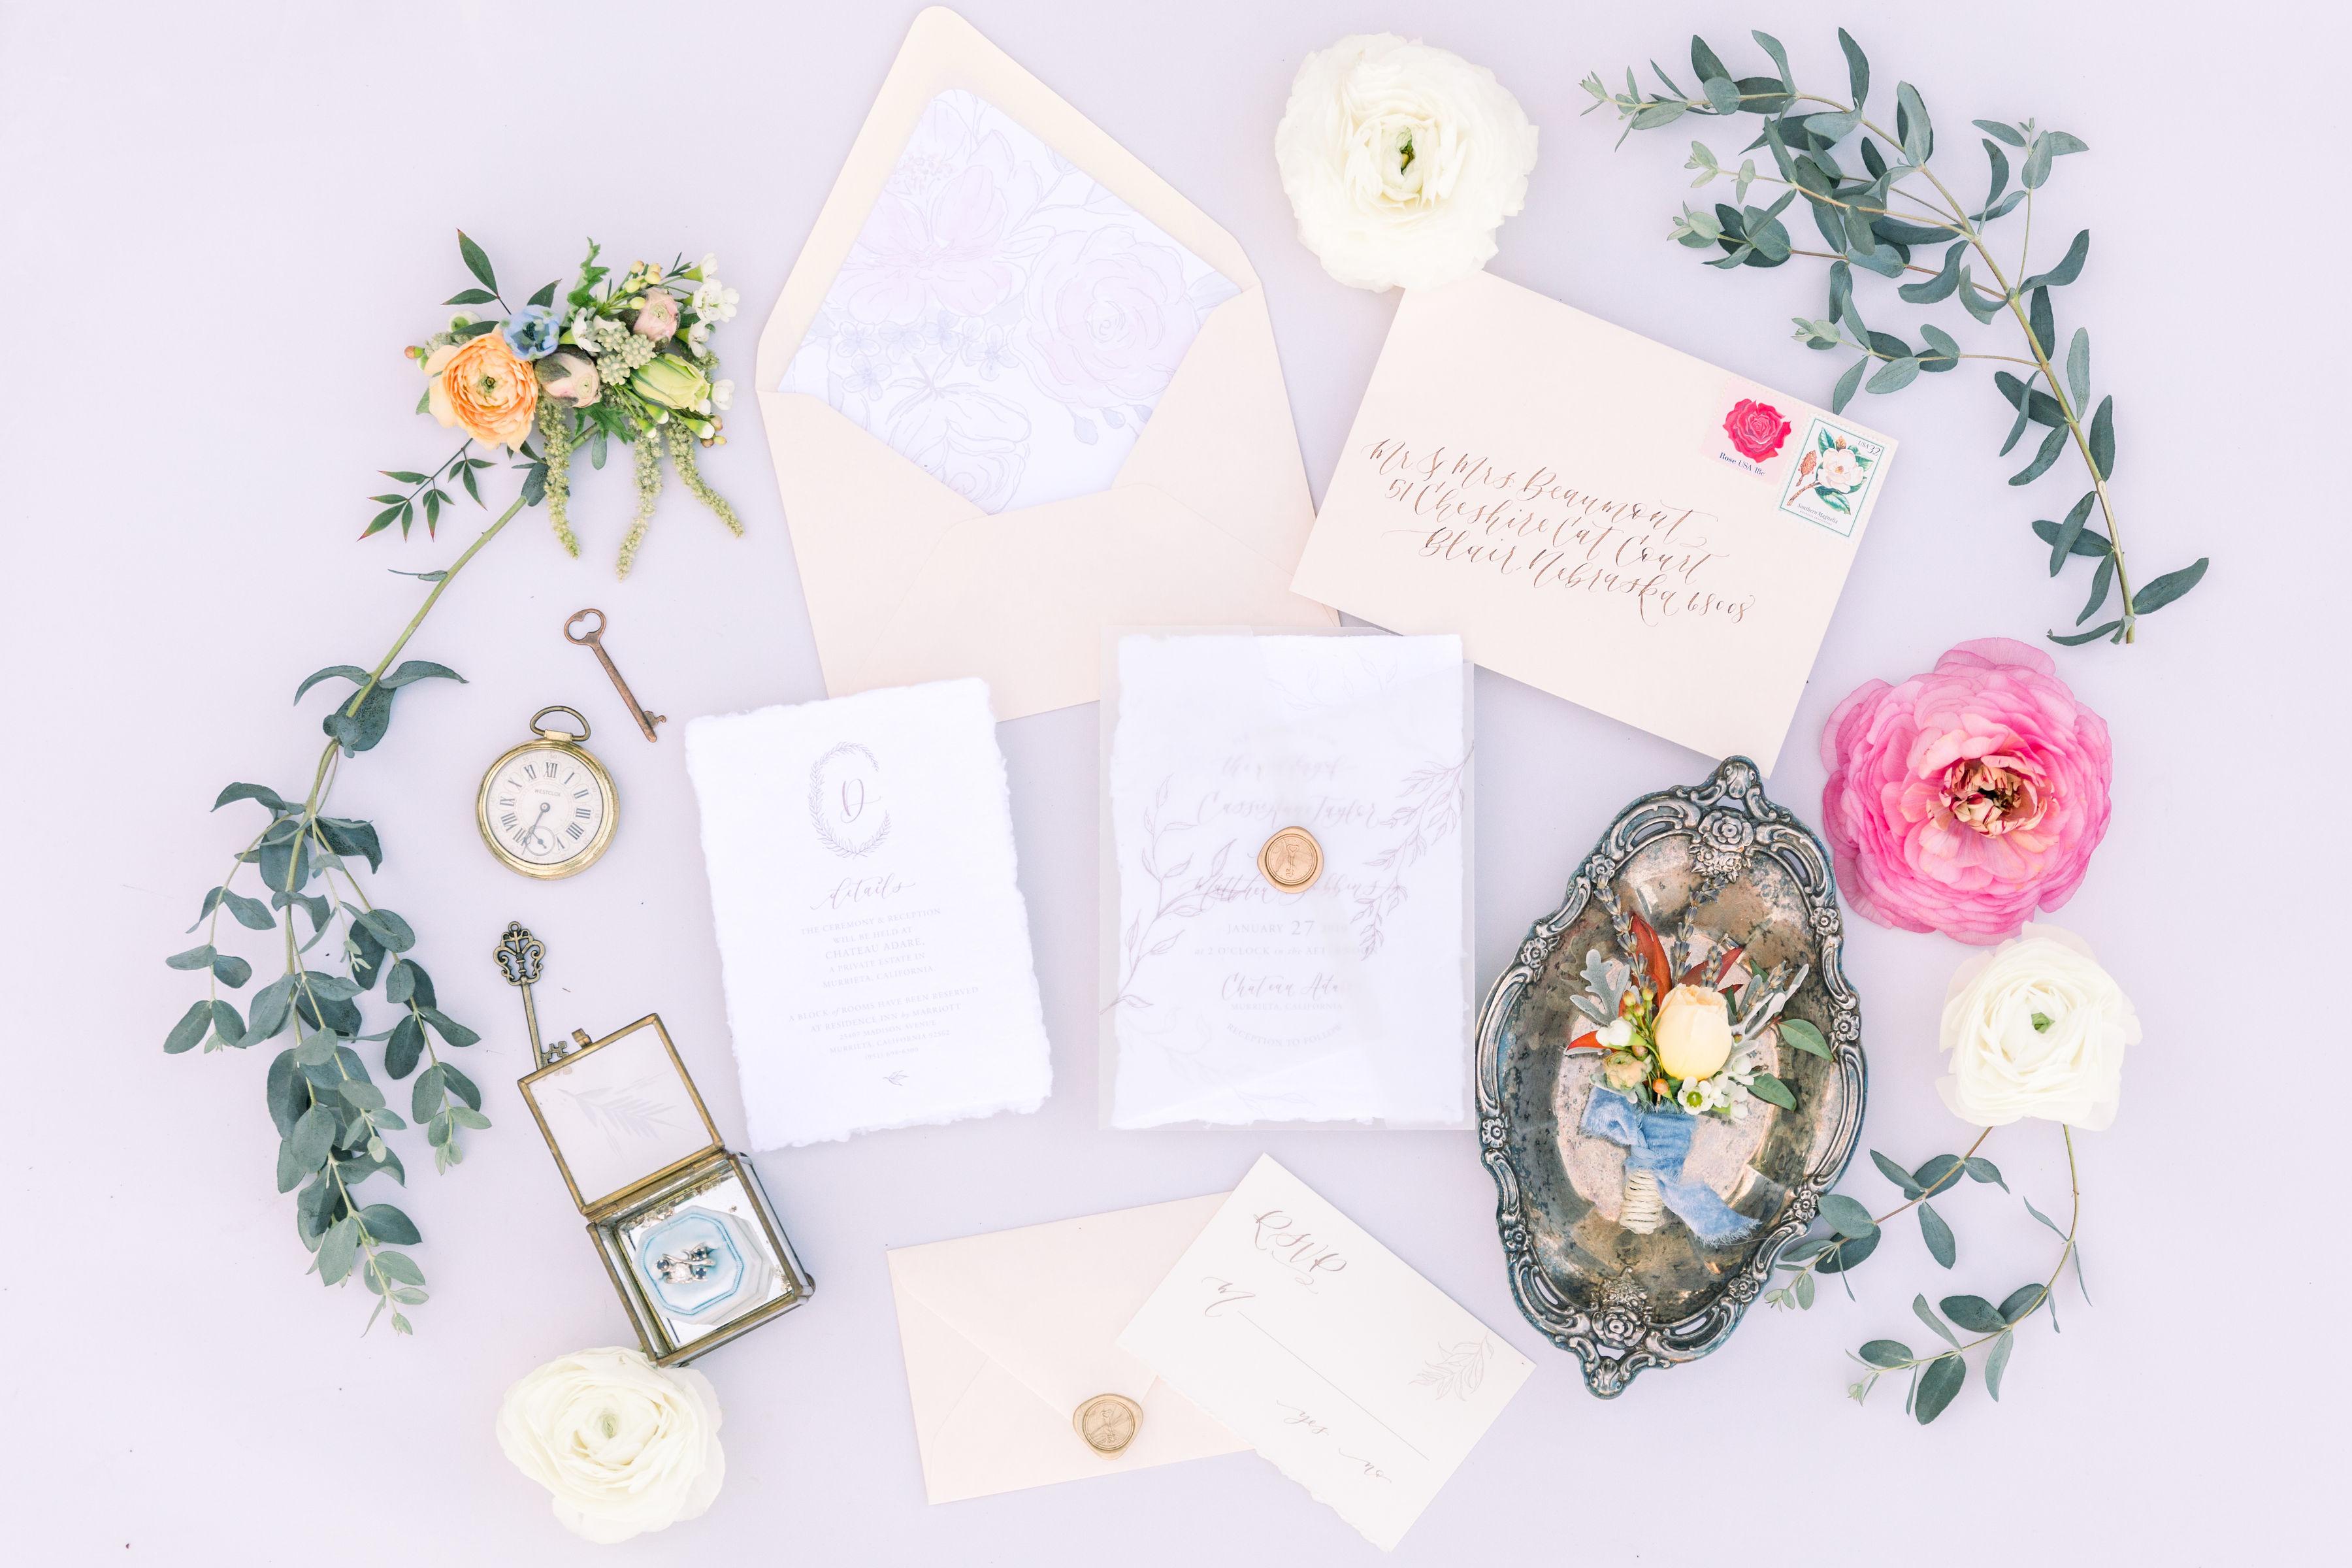 StephanieWeberPhotography-Alice-in-Wonderland-garden-wedding-invitation